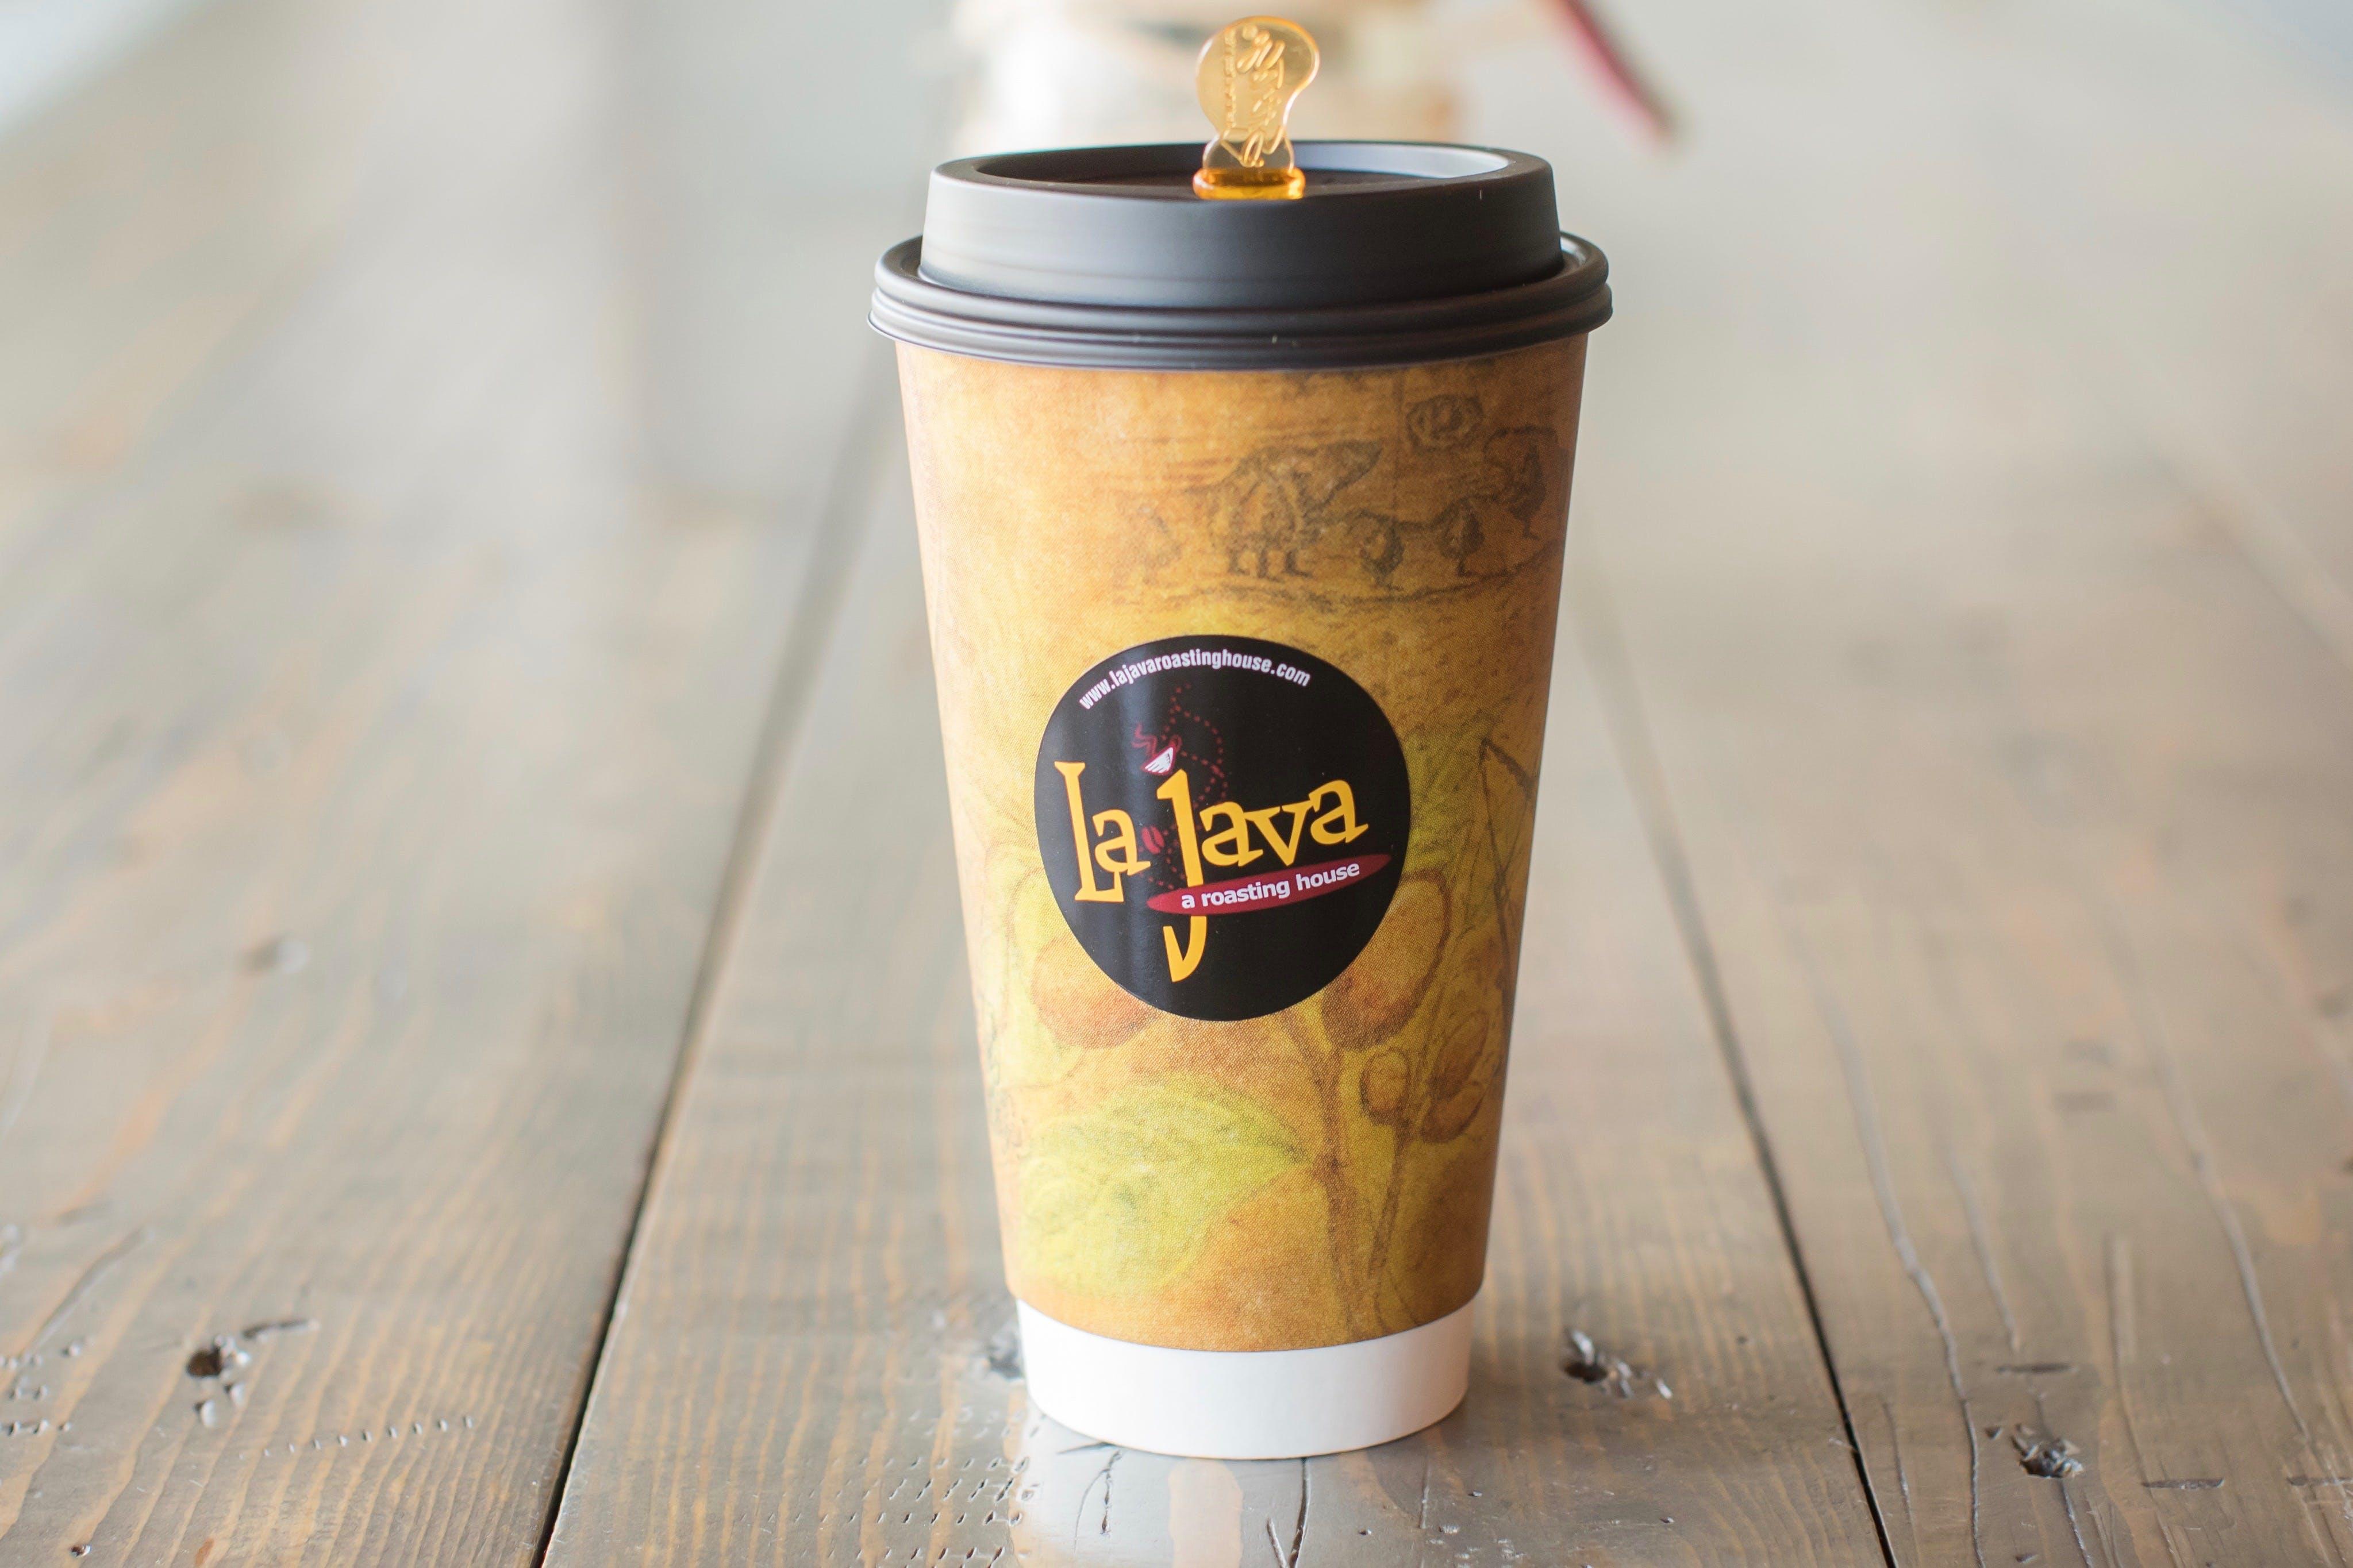 Medium Roast Coffee from La Java - Cardinal in Green Bay, WI